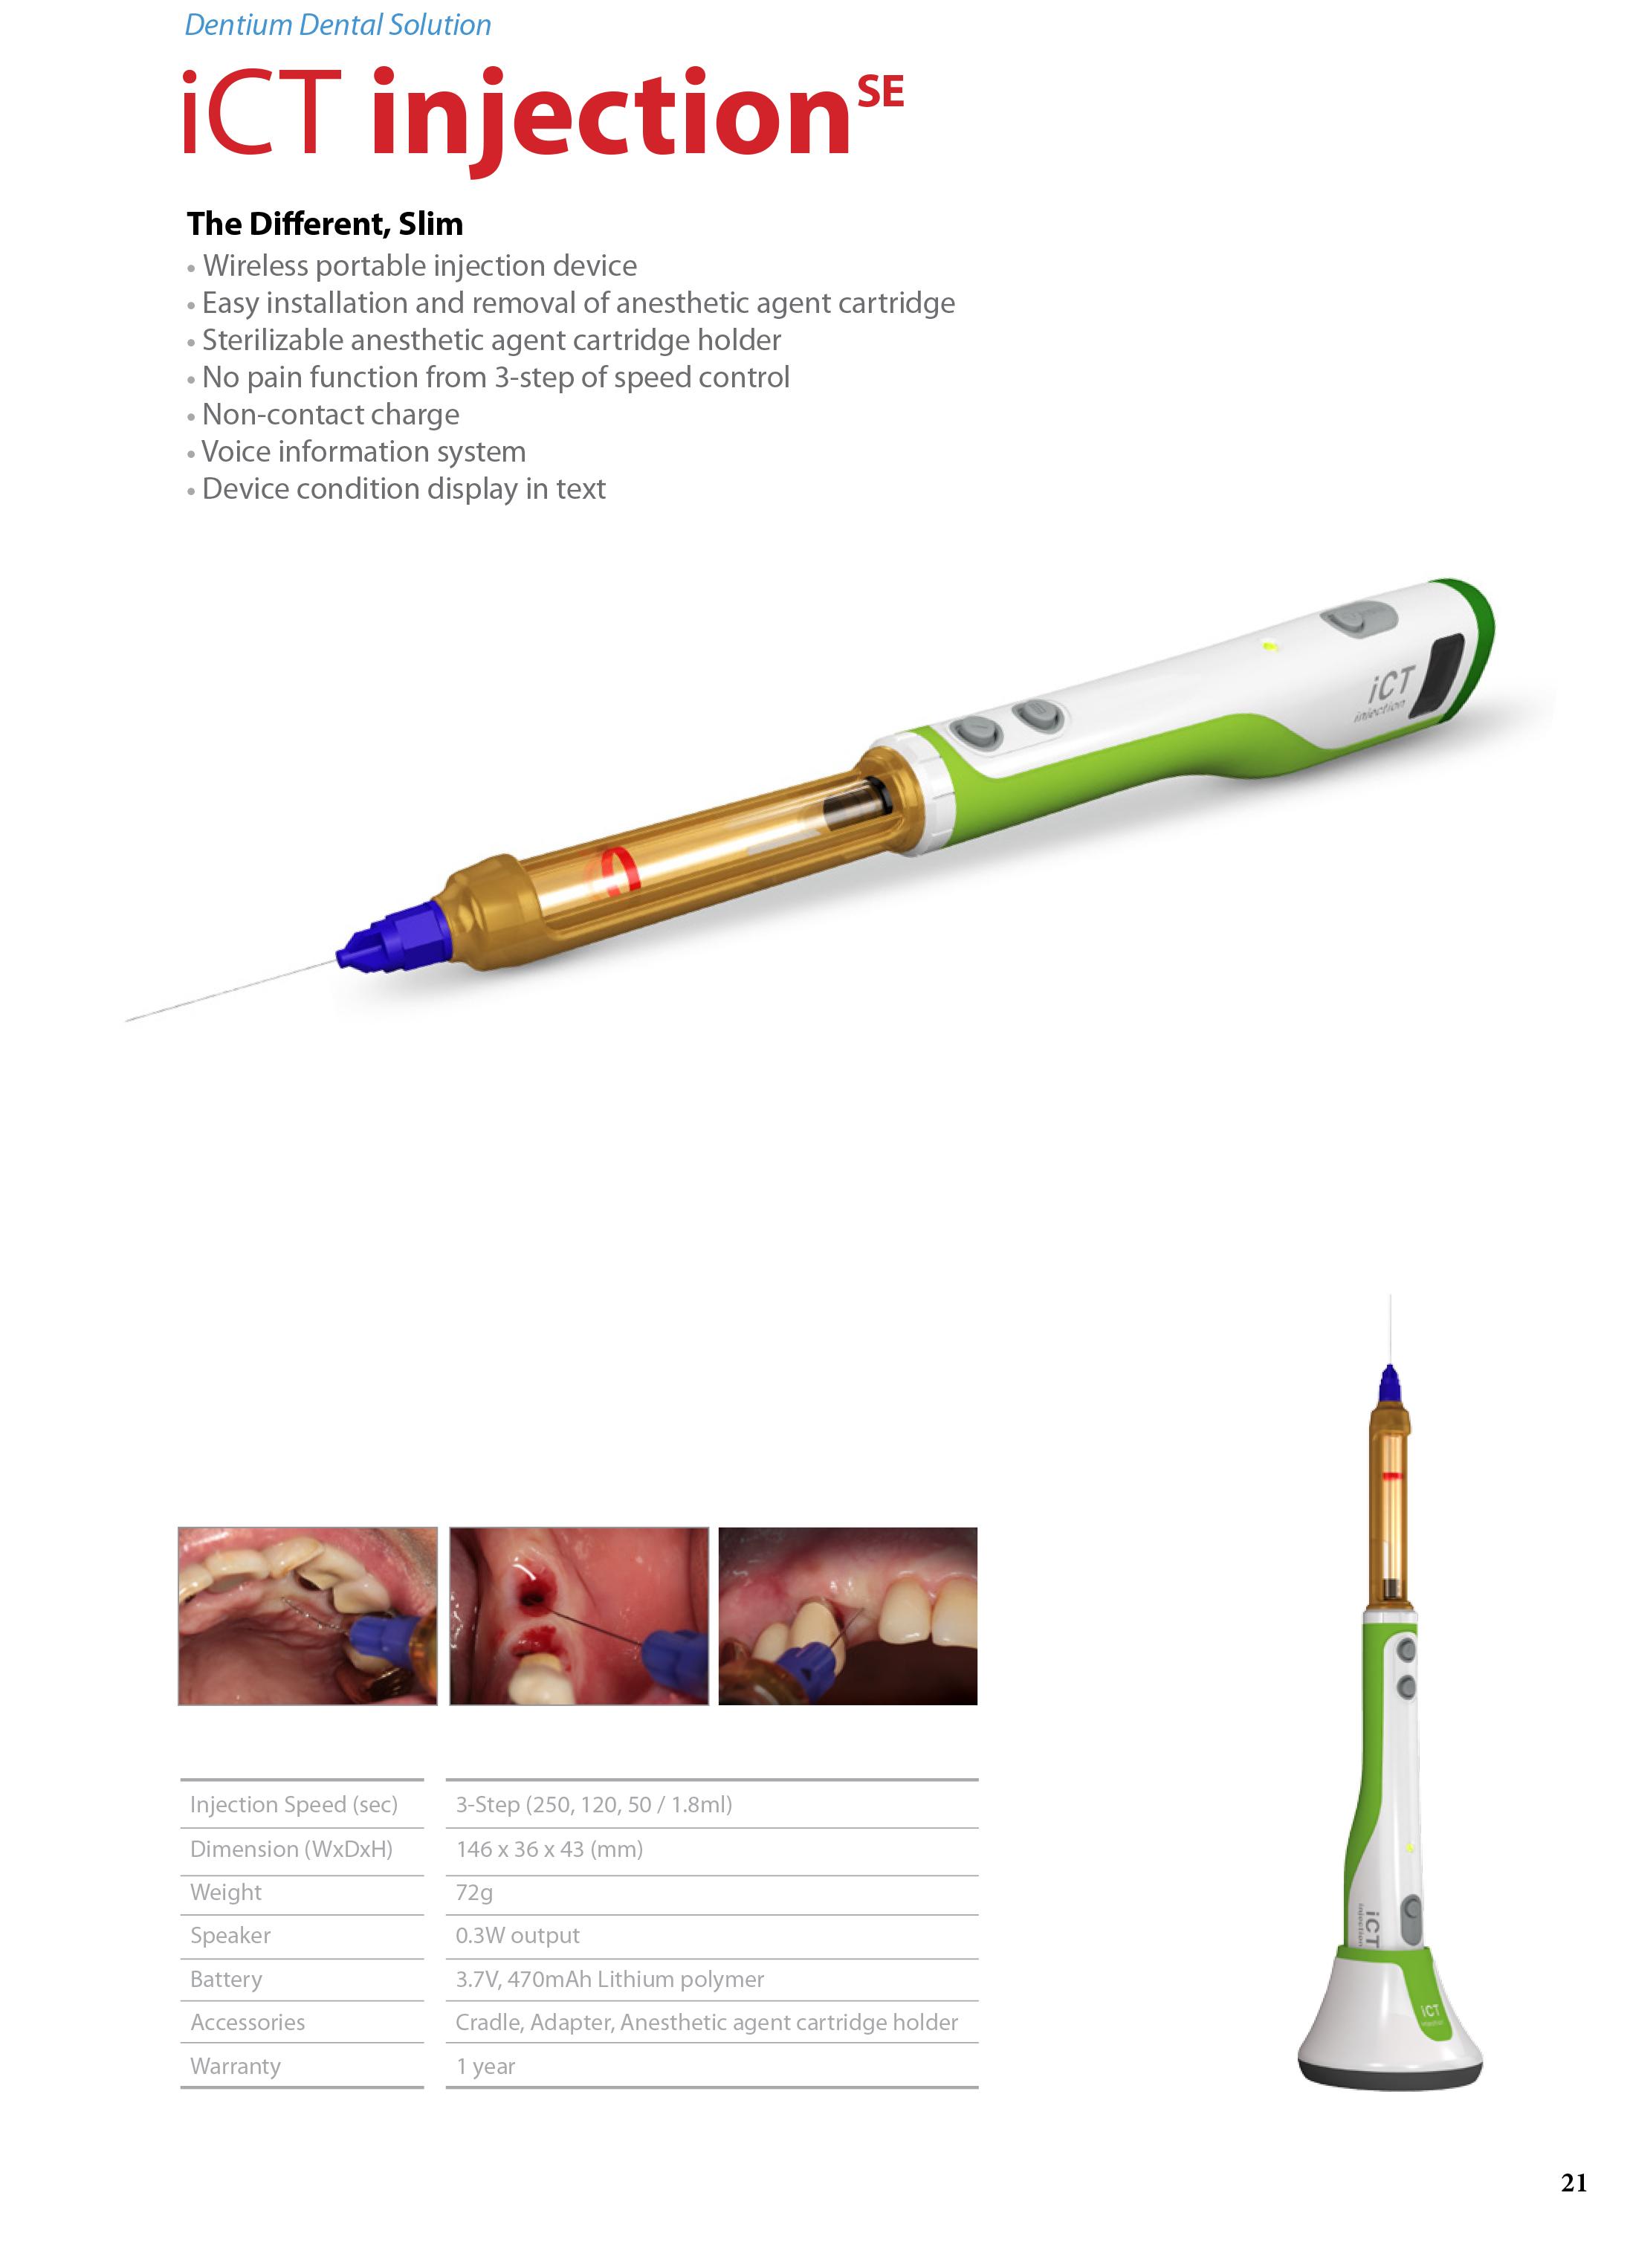 ict injection-spruta